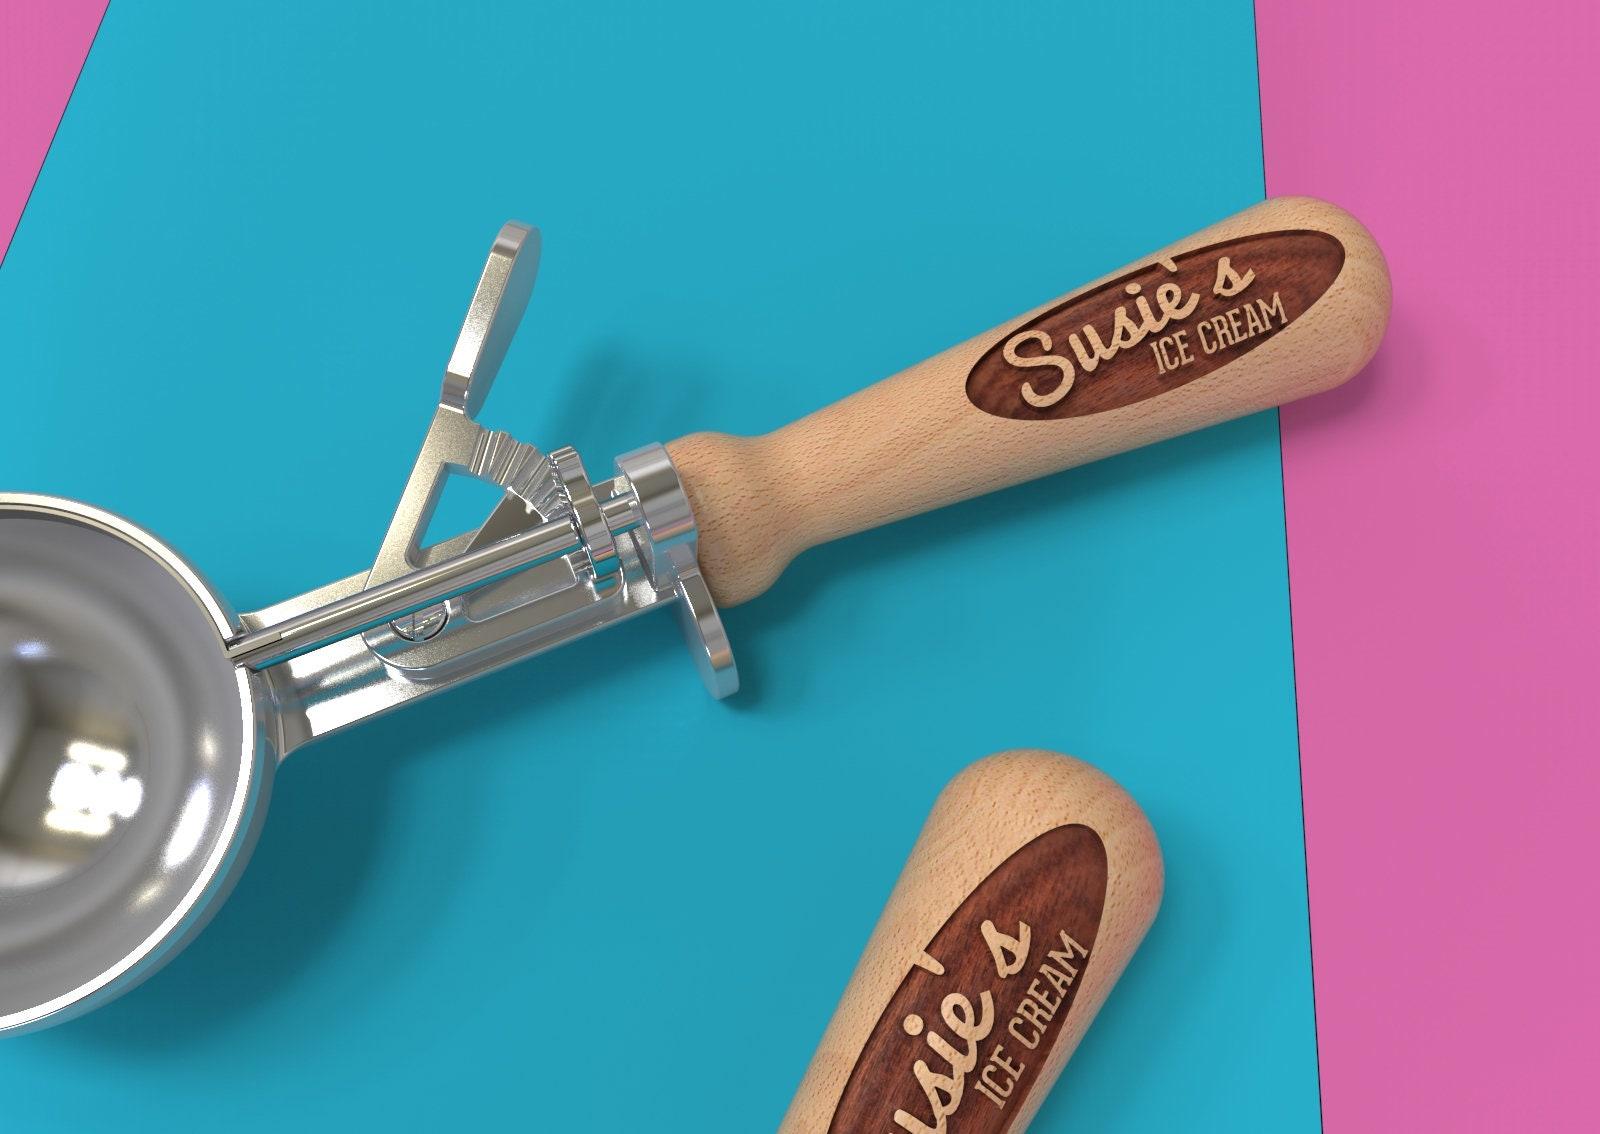 Personalized Ice Cream Scoop Homemade Ice Cream Housewarming